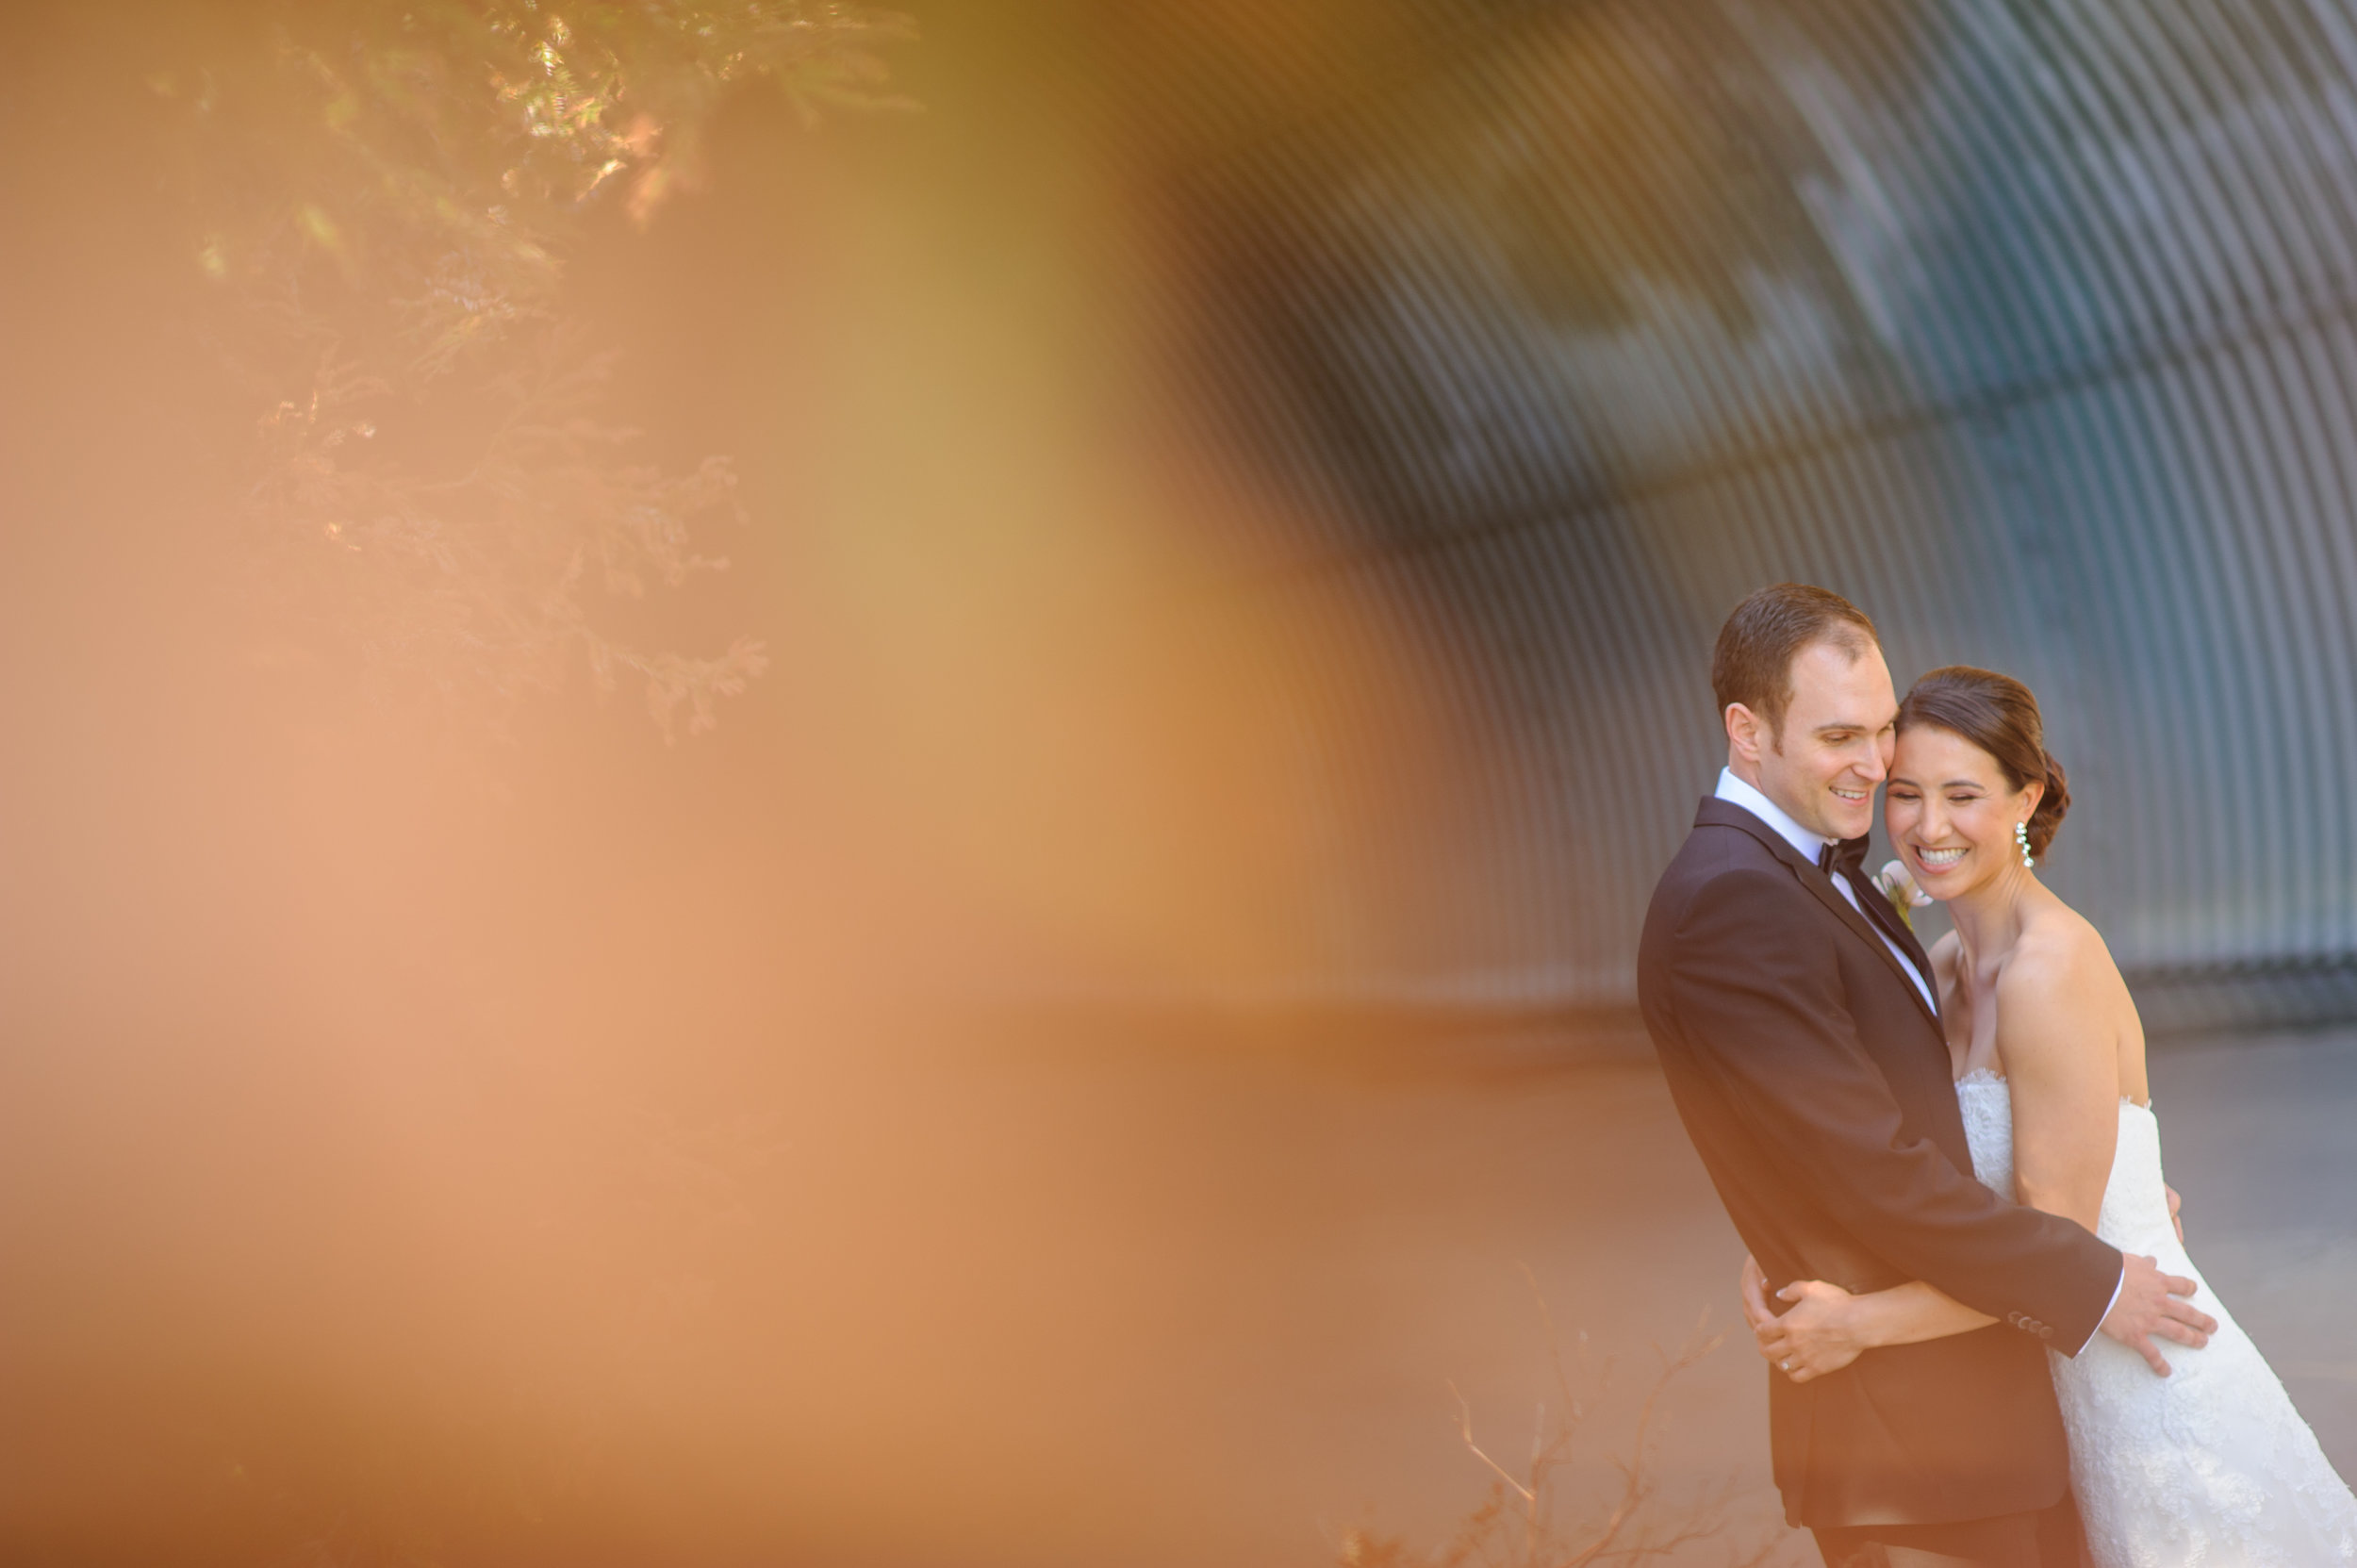 lindsey-jake-011-the-bridges-golf-course-san-ramon-wedding-photographer-katherine-nicole-photography.JPG